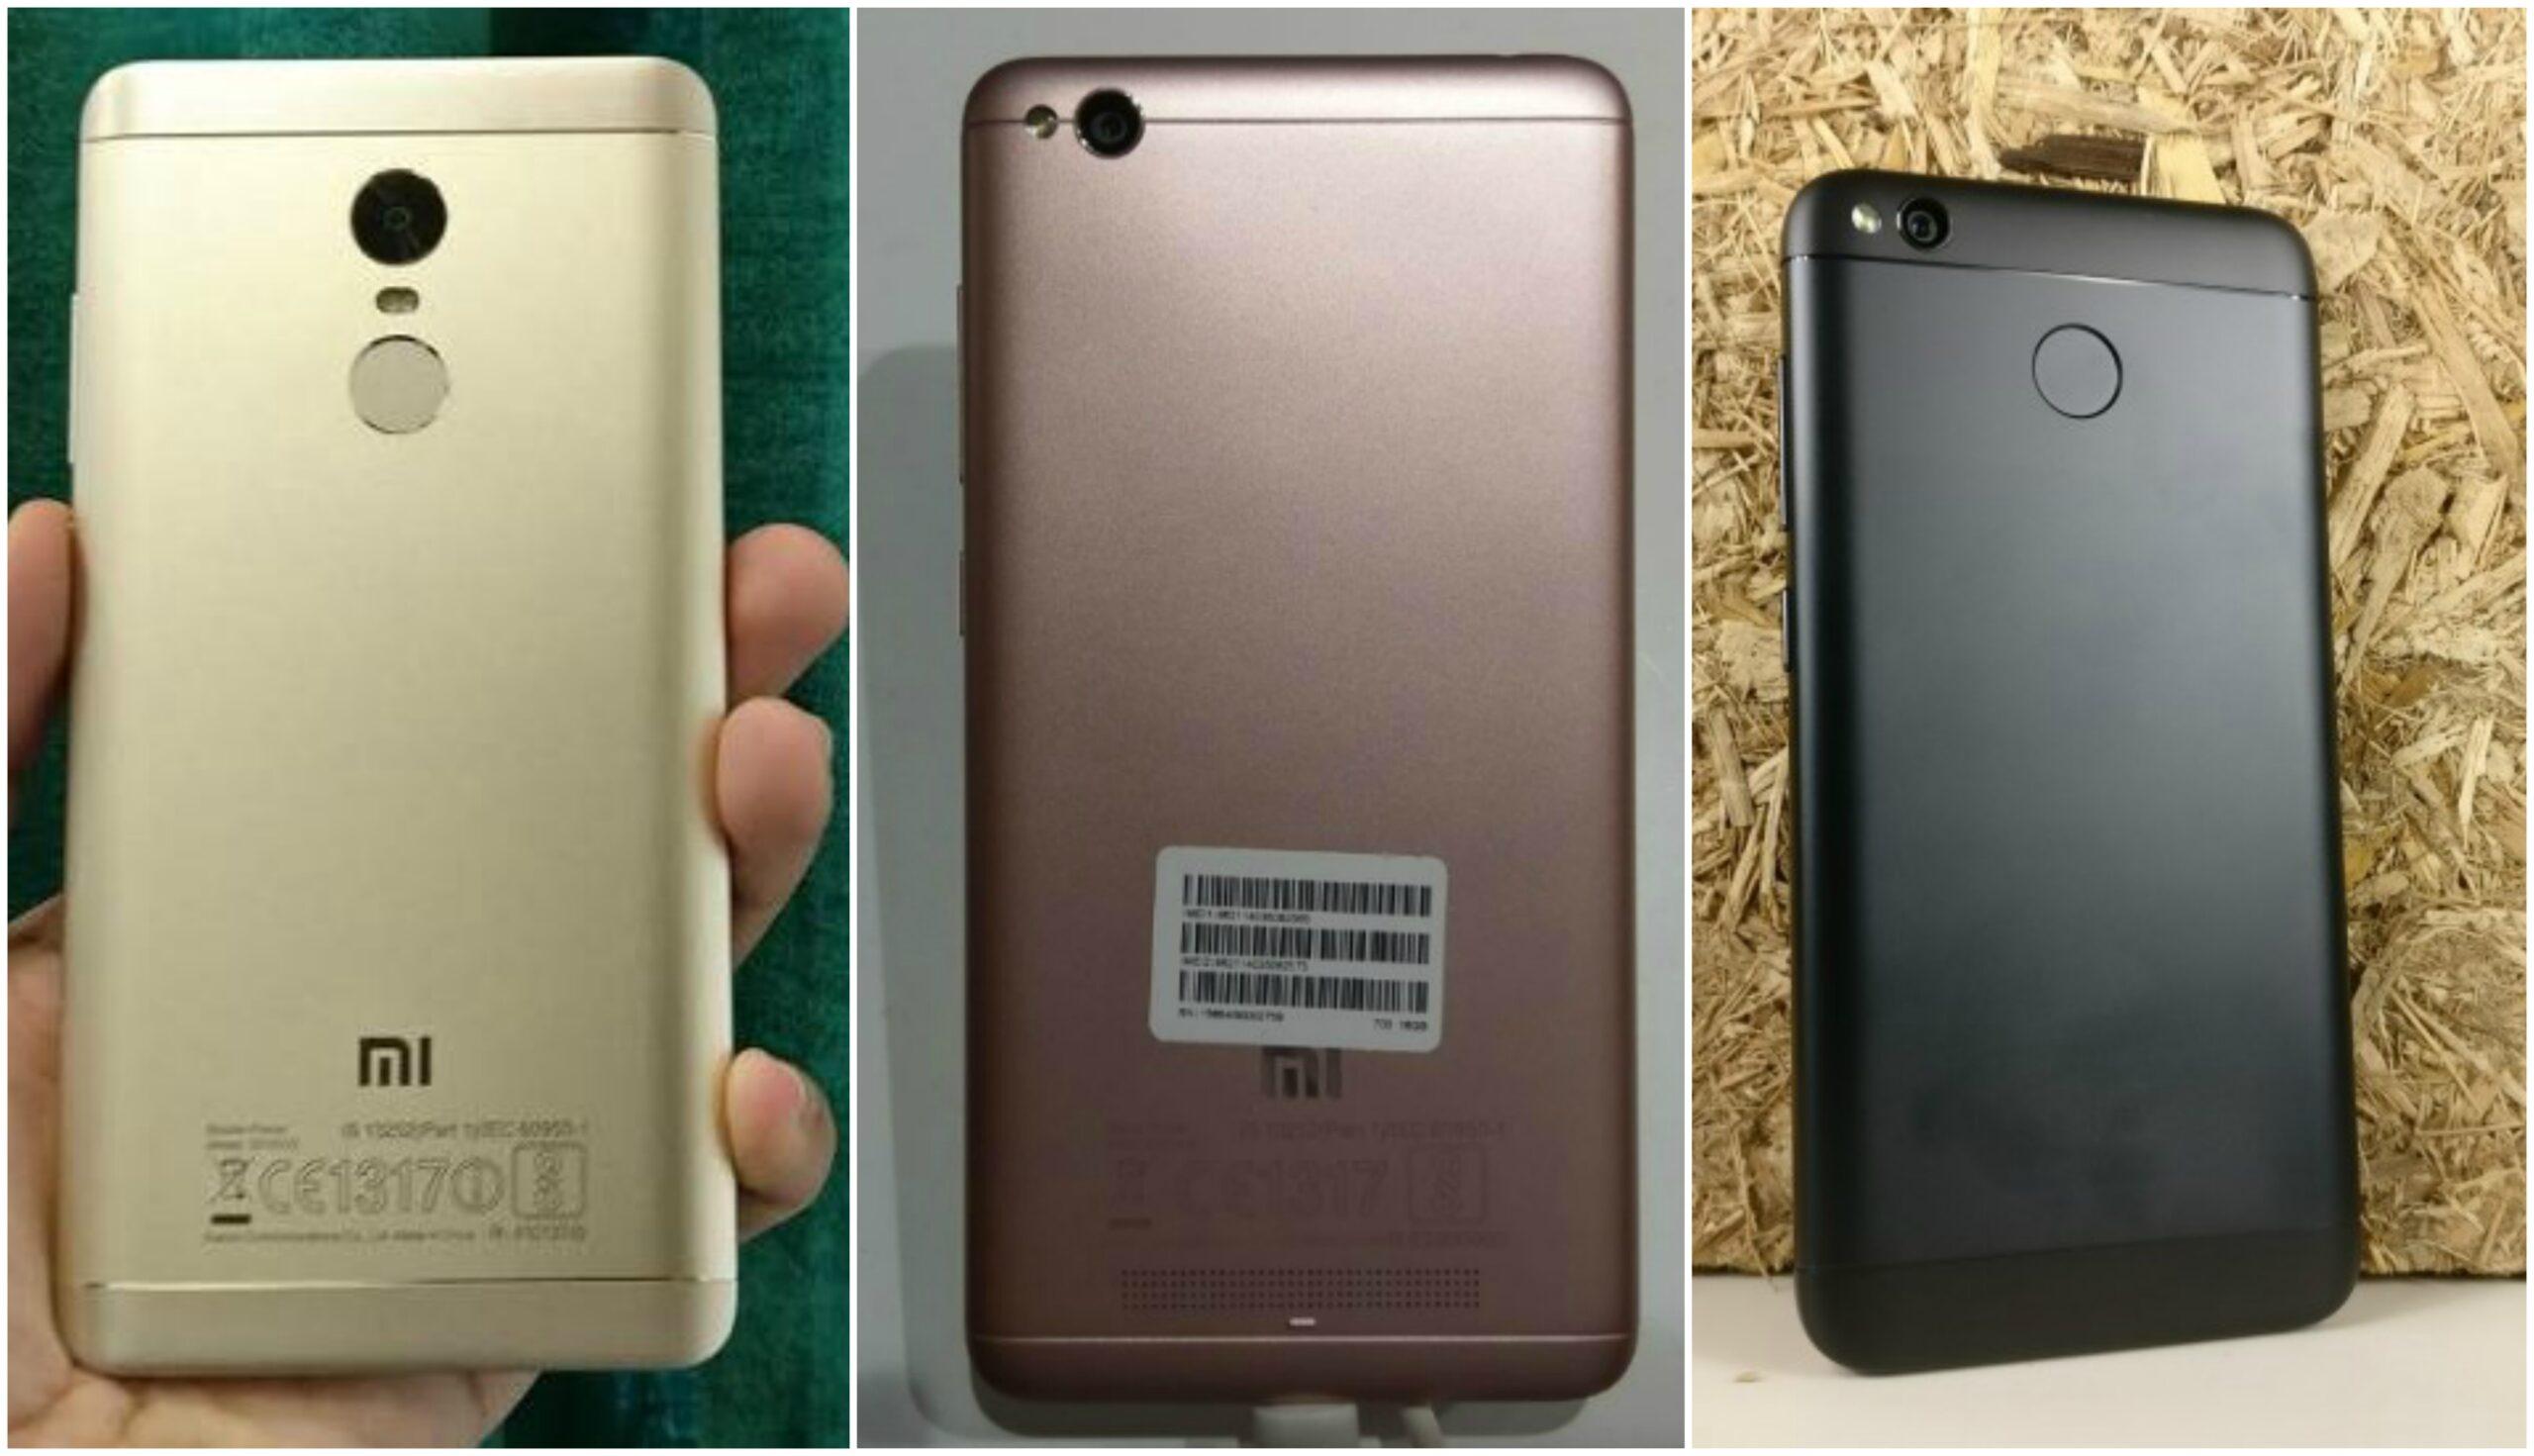 Xiaomi Redmi 4 Vs Redmi Note 4 Vs Redmi 4A, what should be your choice?